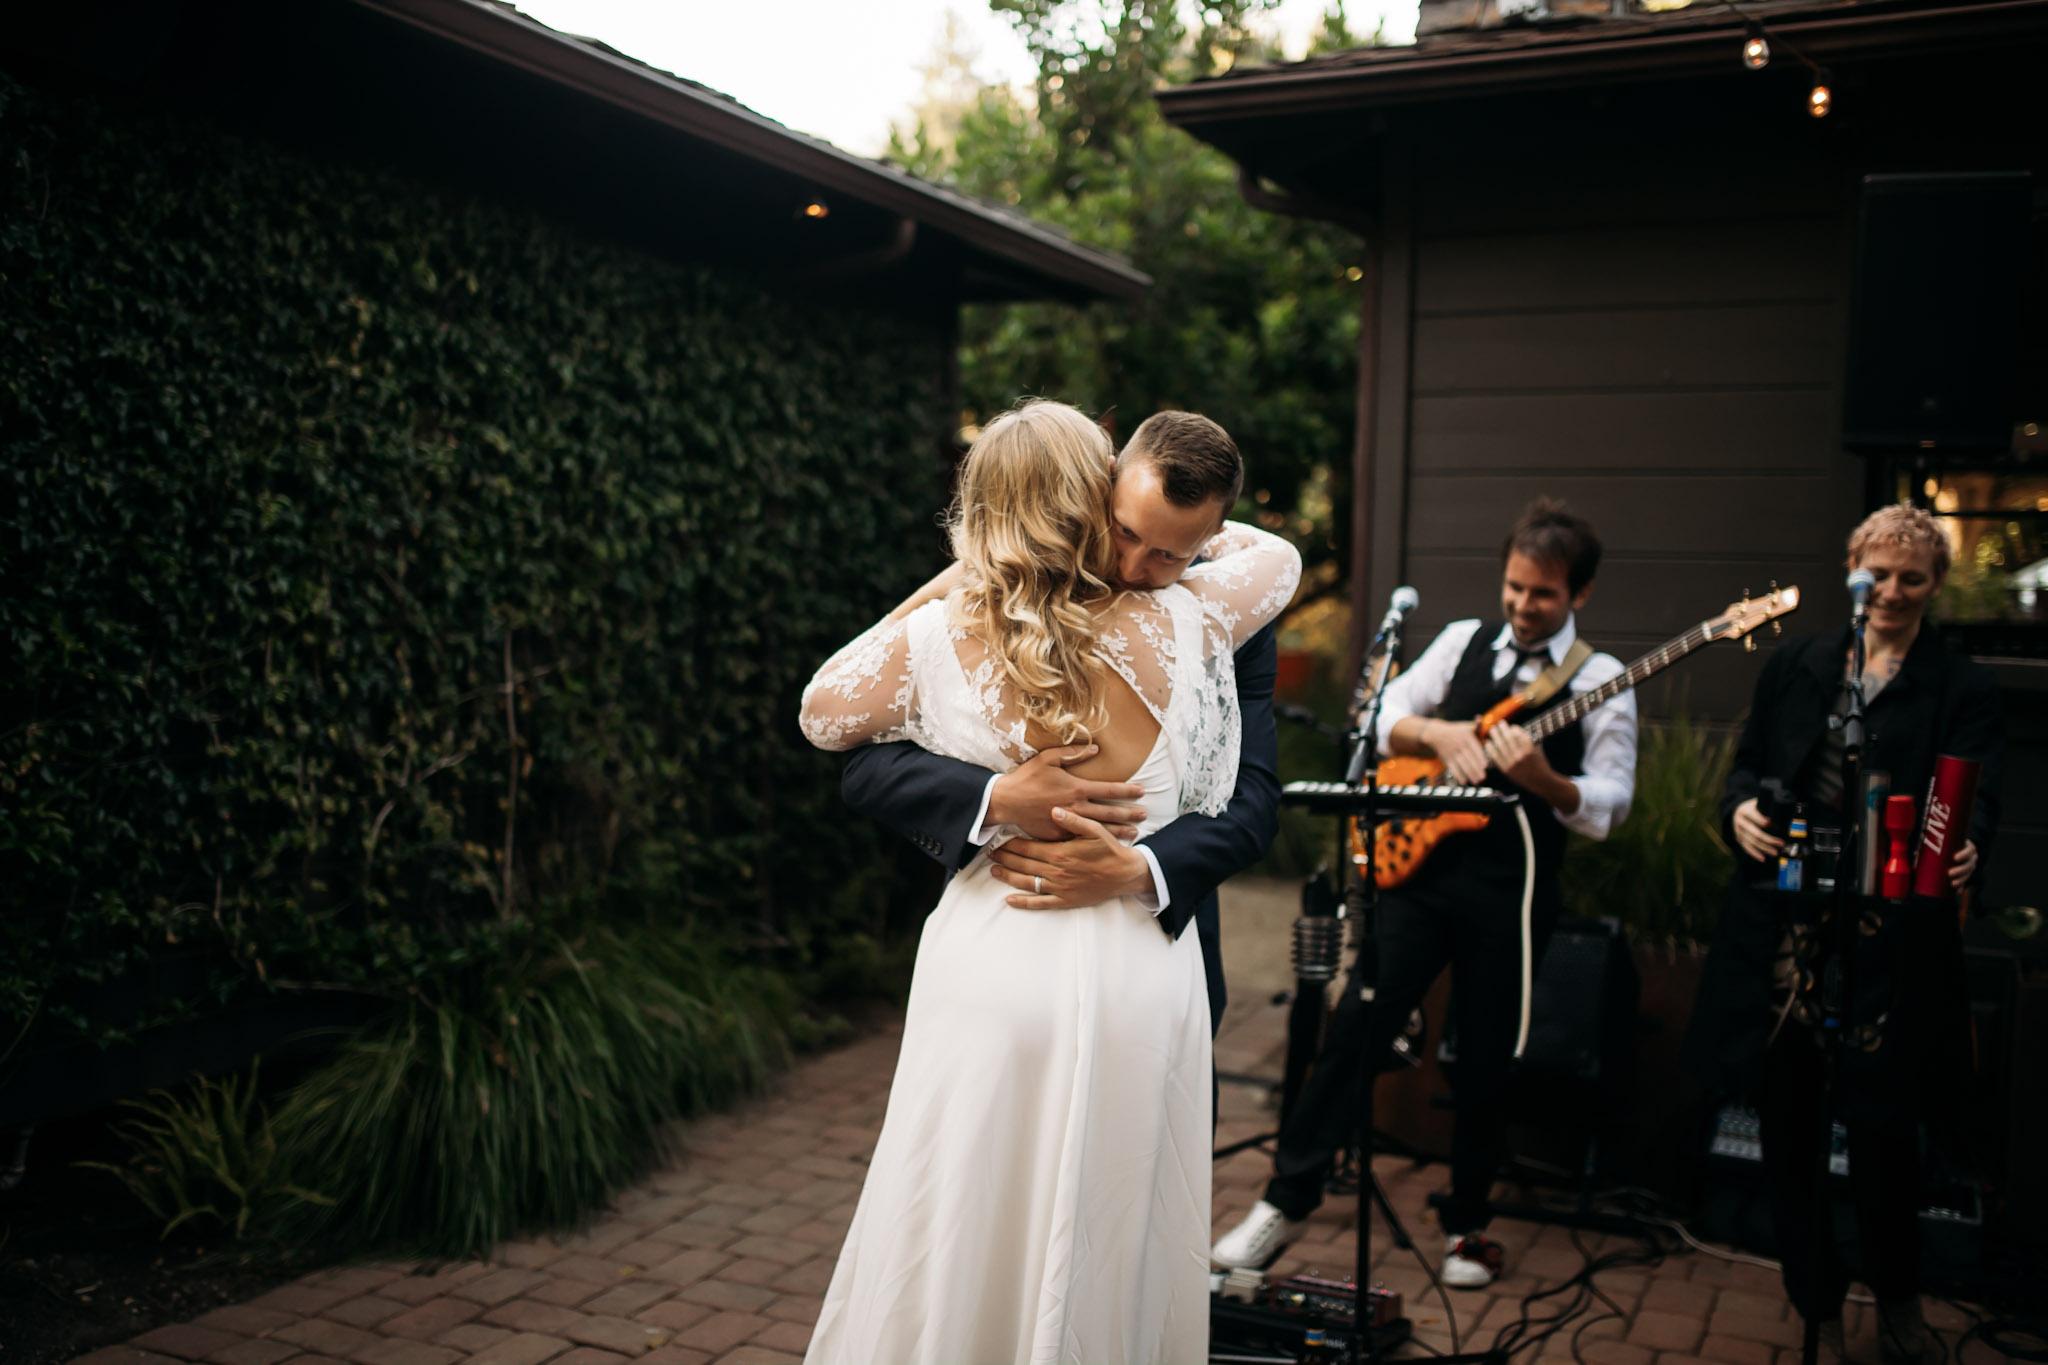 Laurel-Eli-Wedding-052617-A1DX3458.jpg